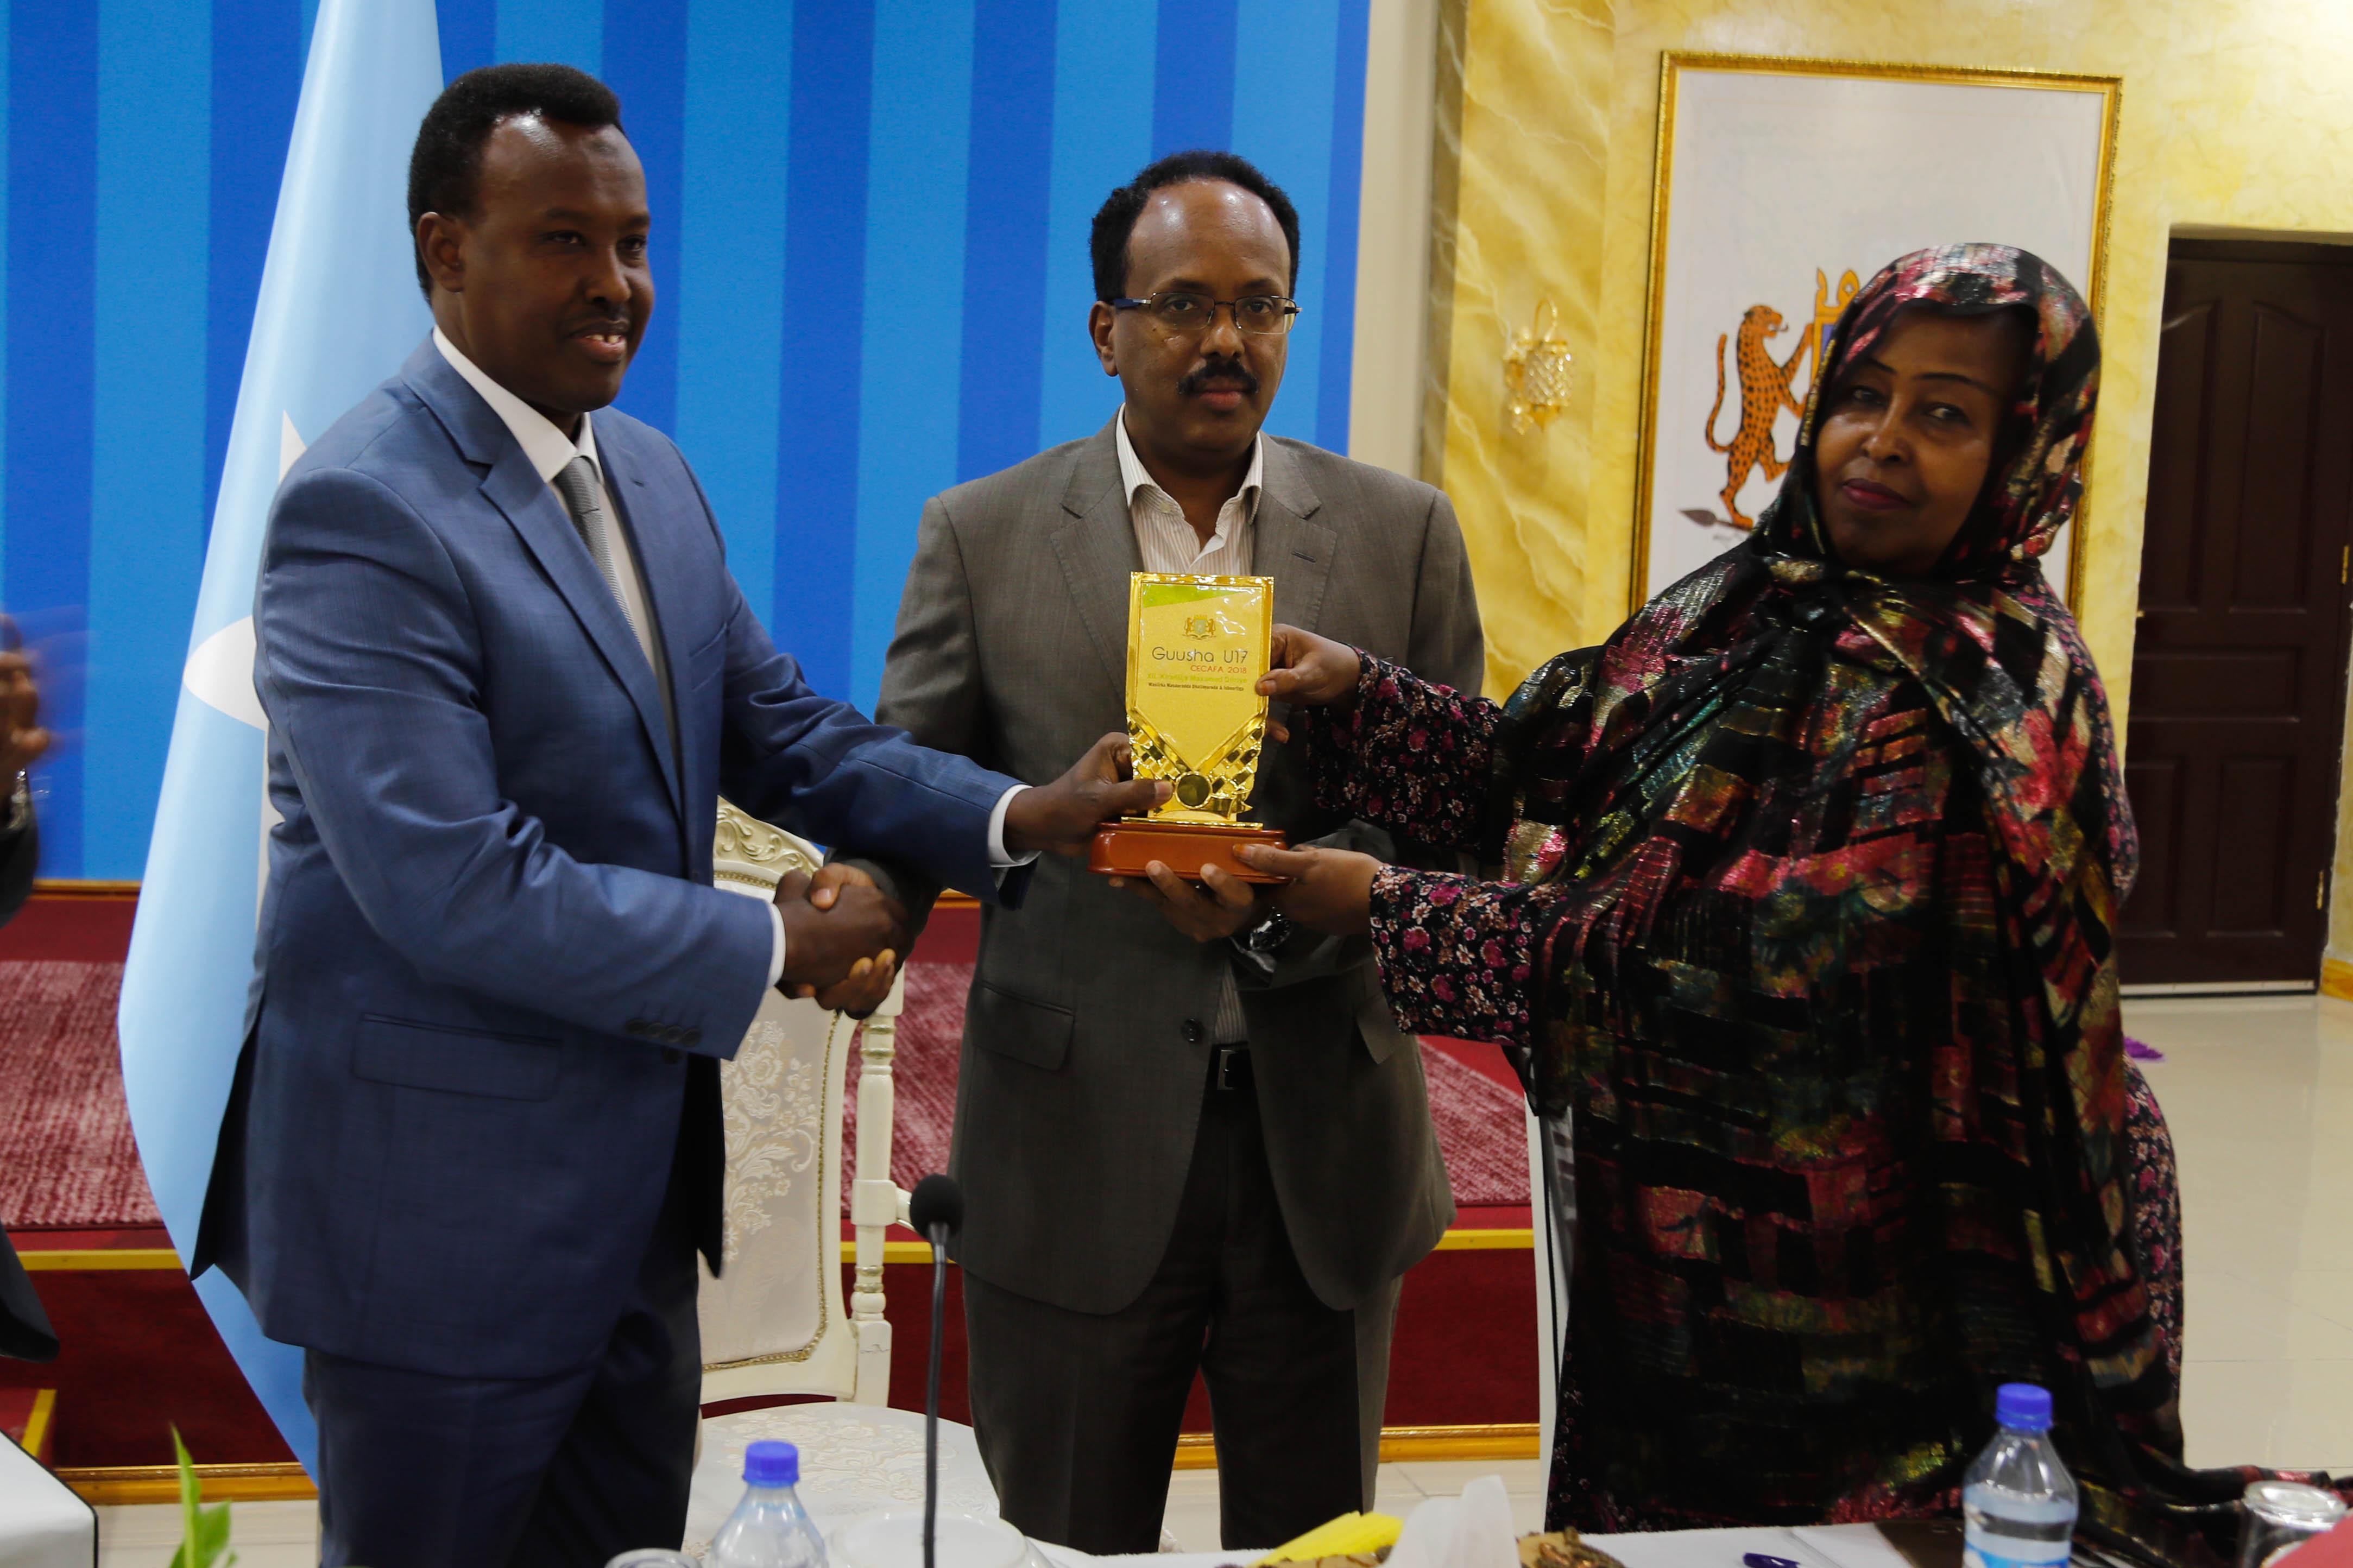 SFF President Abdiqani Said Arab receives the Historic Football Achievement Award from the president of the federal republic of Somalia Mohamed Abdulahi Mohamed as minister of sport Hon. Khadija Mohamed Diriye is pictured on the